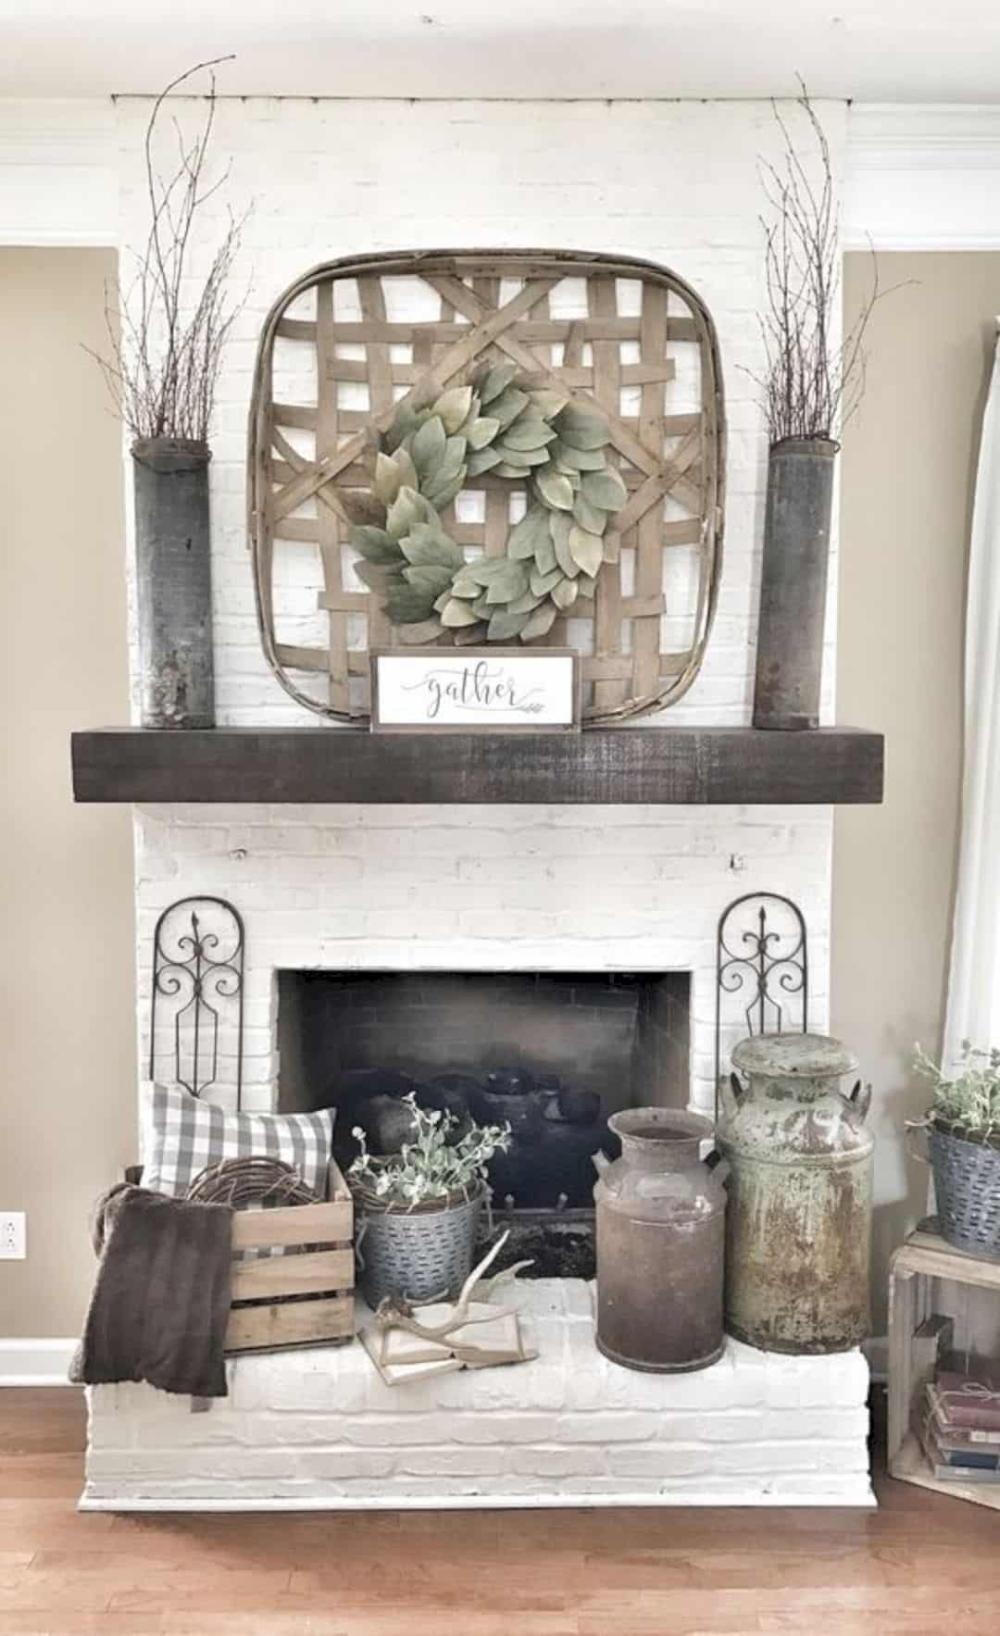 16 Fireplace Mantel Decorating Ideas  Futurist Architecture   seasonal mantel decorating ideas